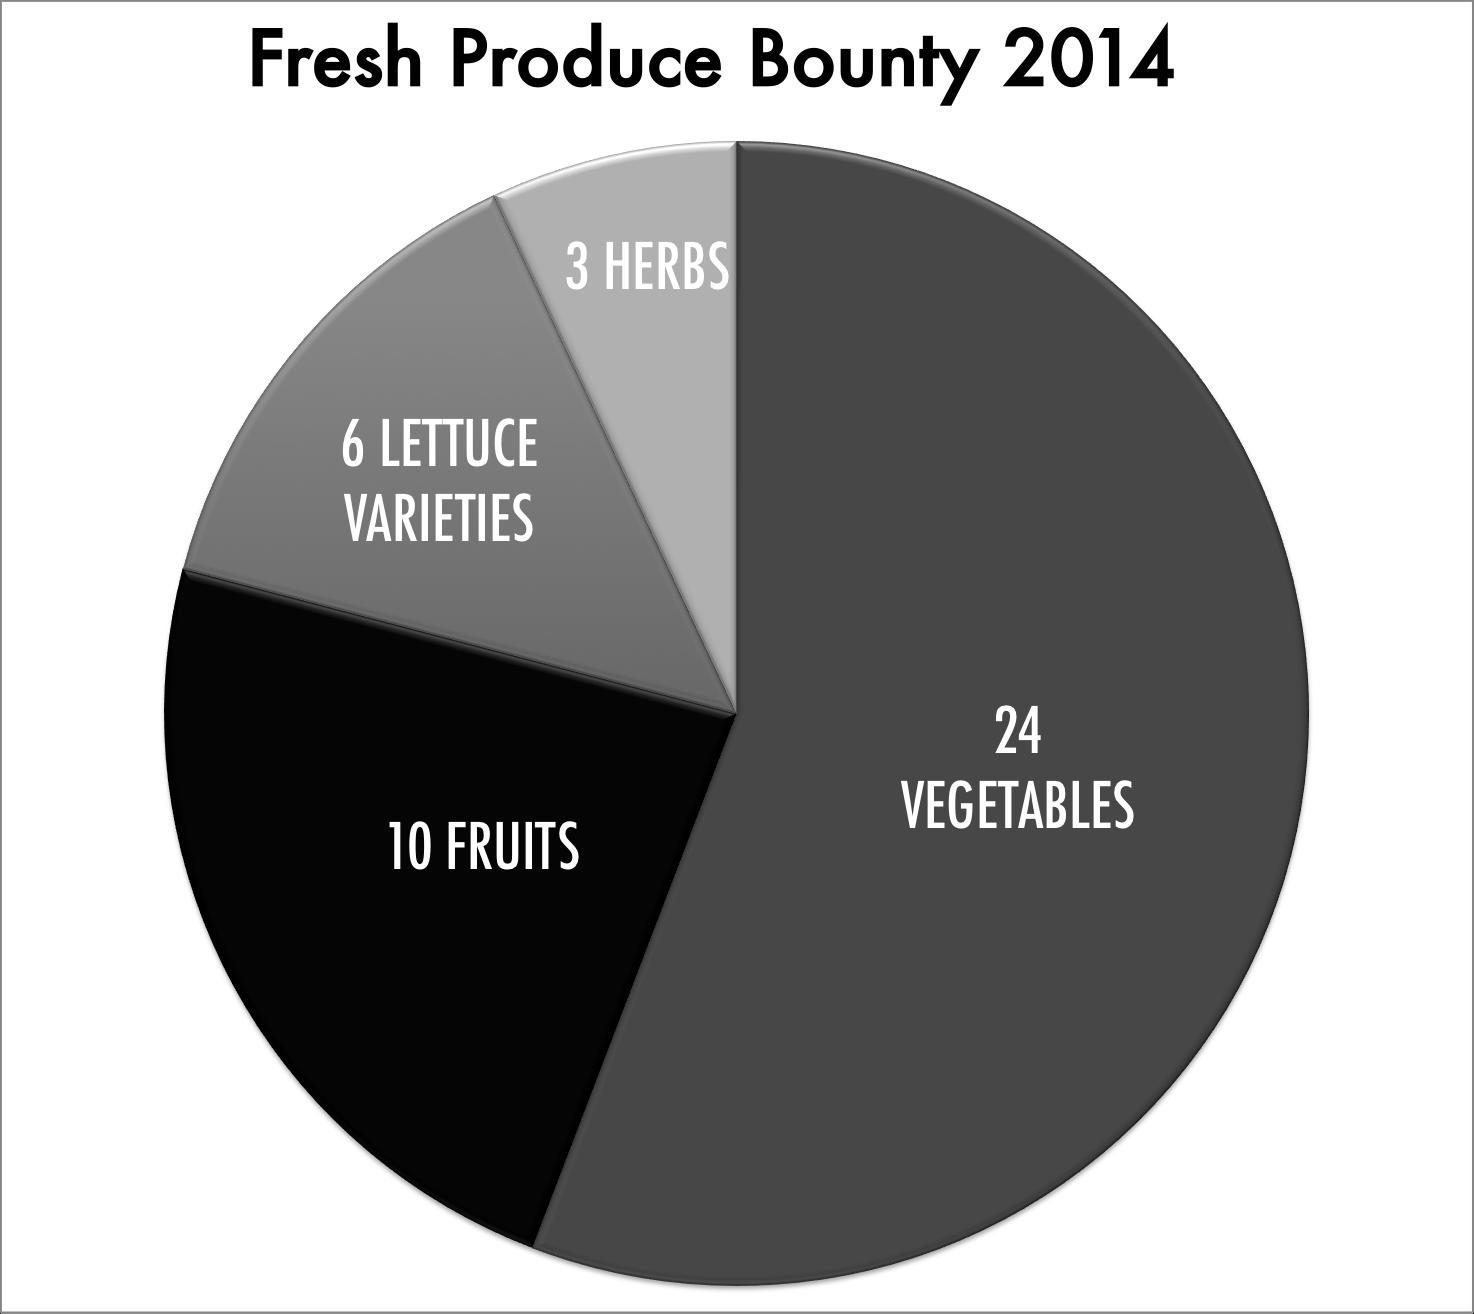 Vegetables, lettuces and herbsincluded asparagus, b  eet, b  ell  p  epper, b  roccoli, Brussels  s  prout, c  abbage, c  arrot, c  auliflower, c  elery, c  ilantro, c  oleslaw, c  orn, c  ucumber, d  ill, e  ggplant, k  ale,l  ettuce(green l  eaf, i  ceberg,romaine, Spring mix, bagged salad mix, mixed greens), m  ushroom, o  nion, p  arsley, p  otato, r  adicchio, r  adish,  s  pinach,  s  weet potato, t  omato, y  ellow squash and z  ucchini.    Fruits included apple, cantaloupe, grape, honeydewmelon, kiwi, orange, pear, strawberry, tangerineand watermelon.